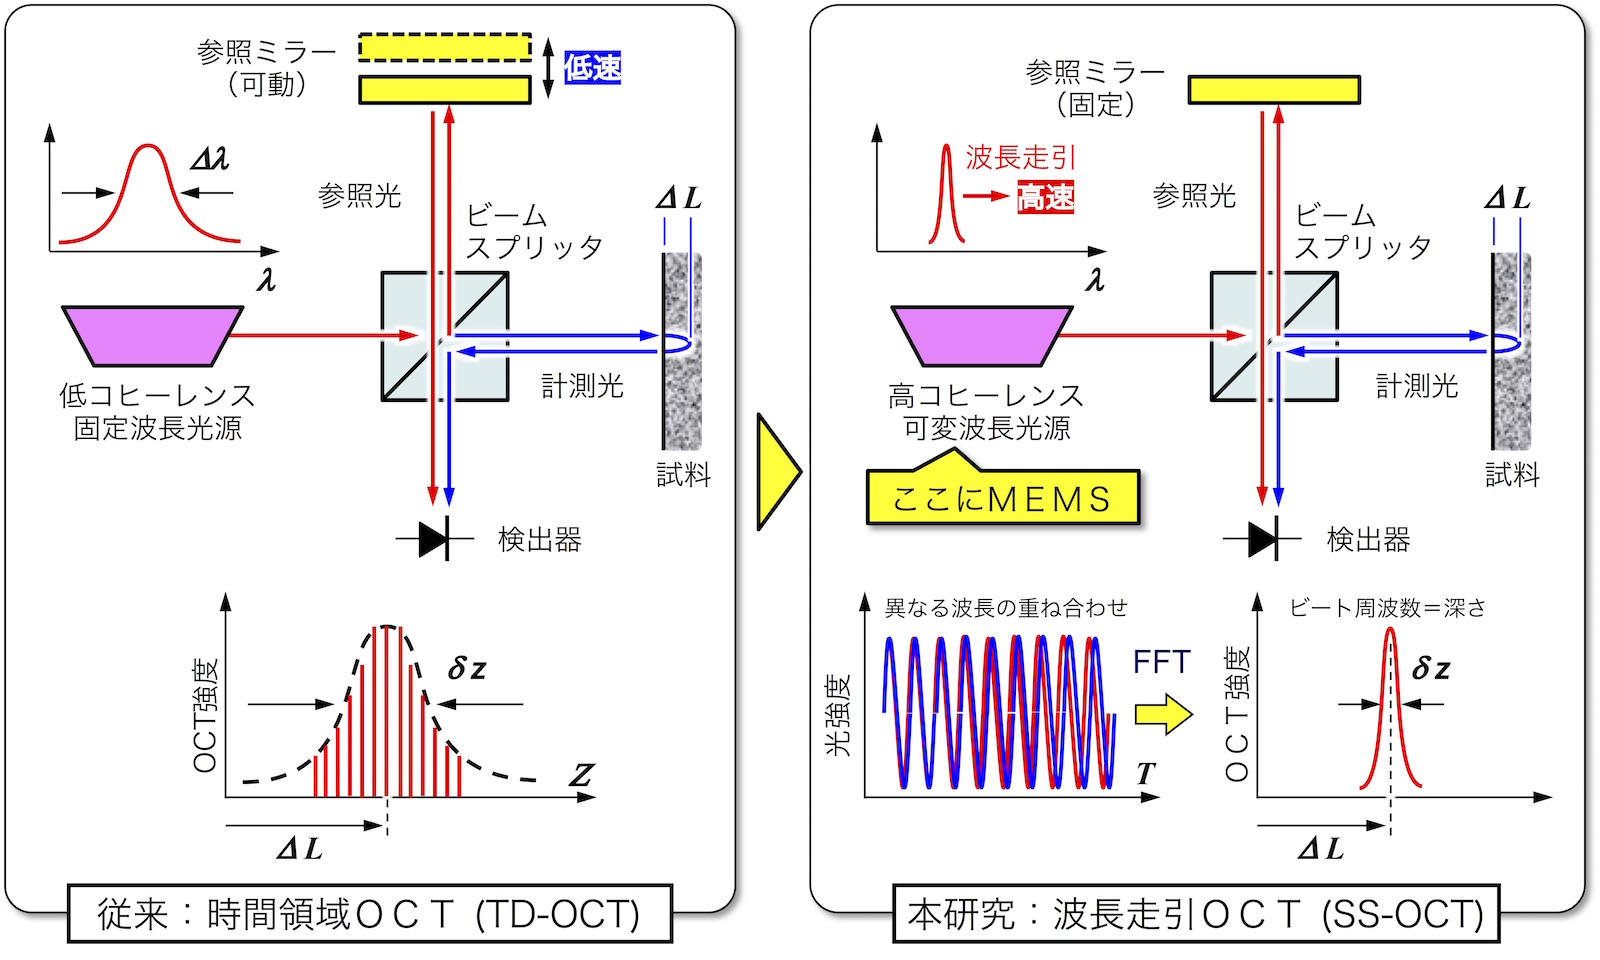 Figure_2.jpg